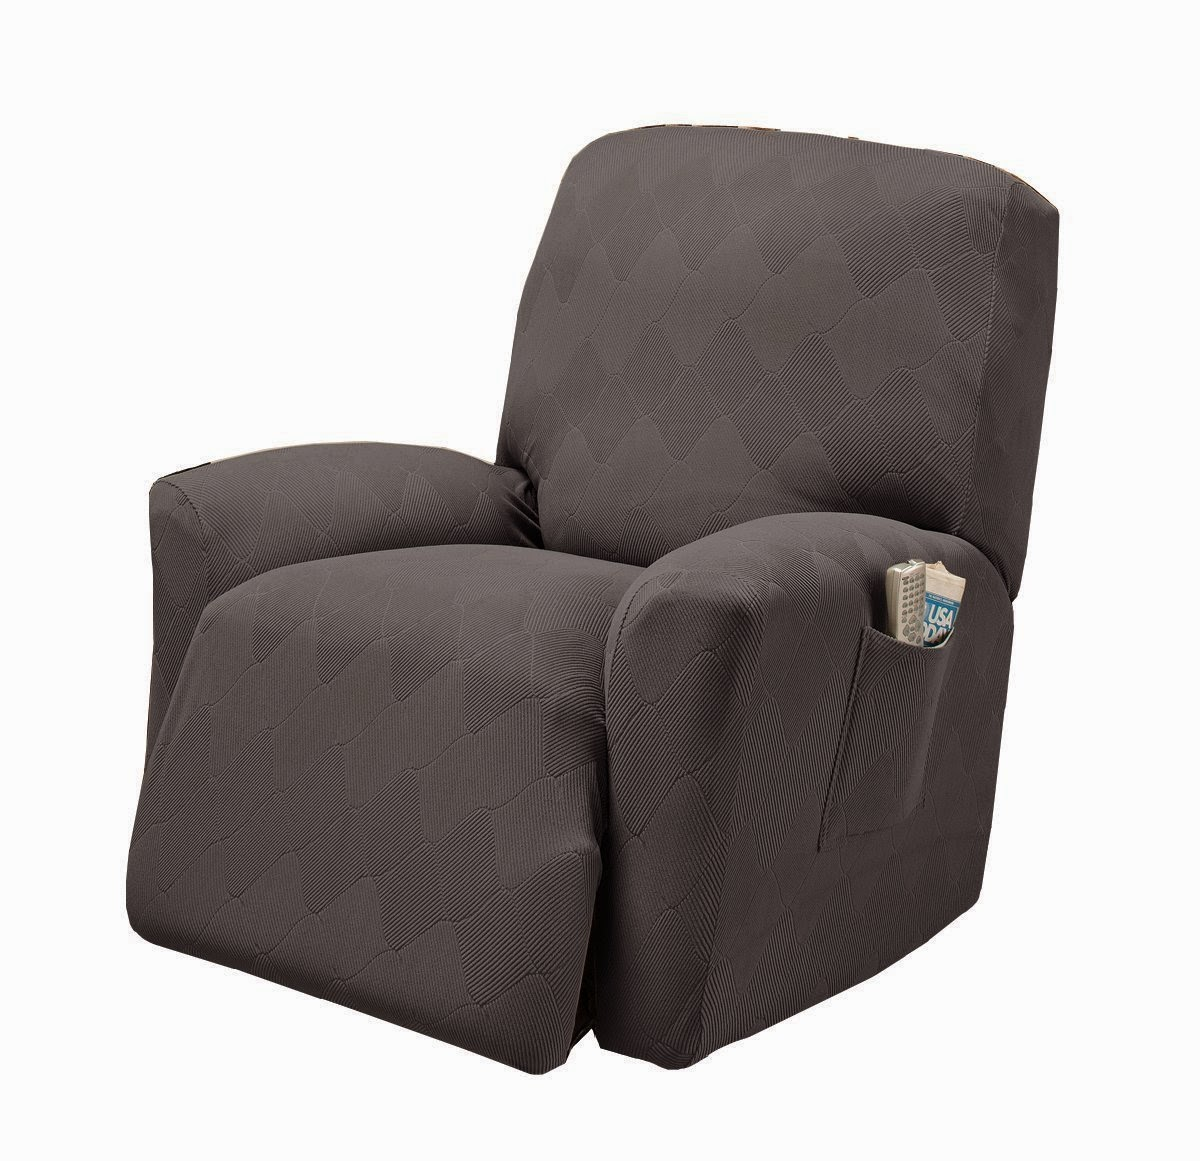 Wonderful Recliner Sofa Slipcovers Walmart